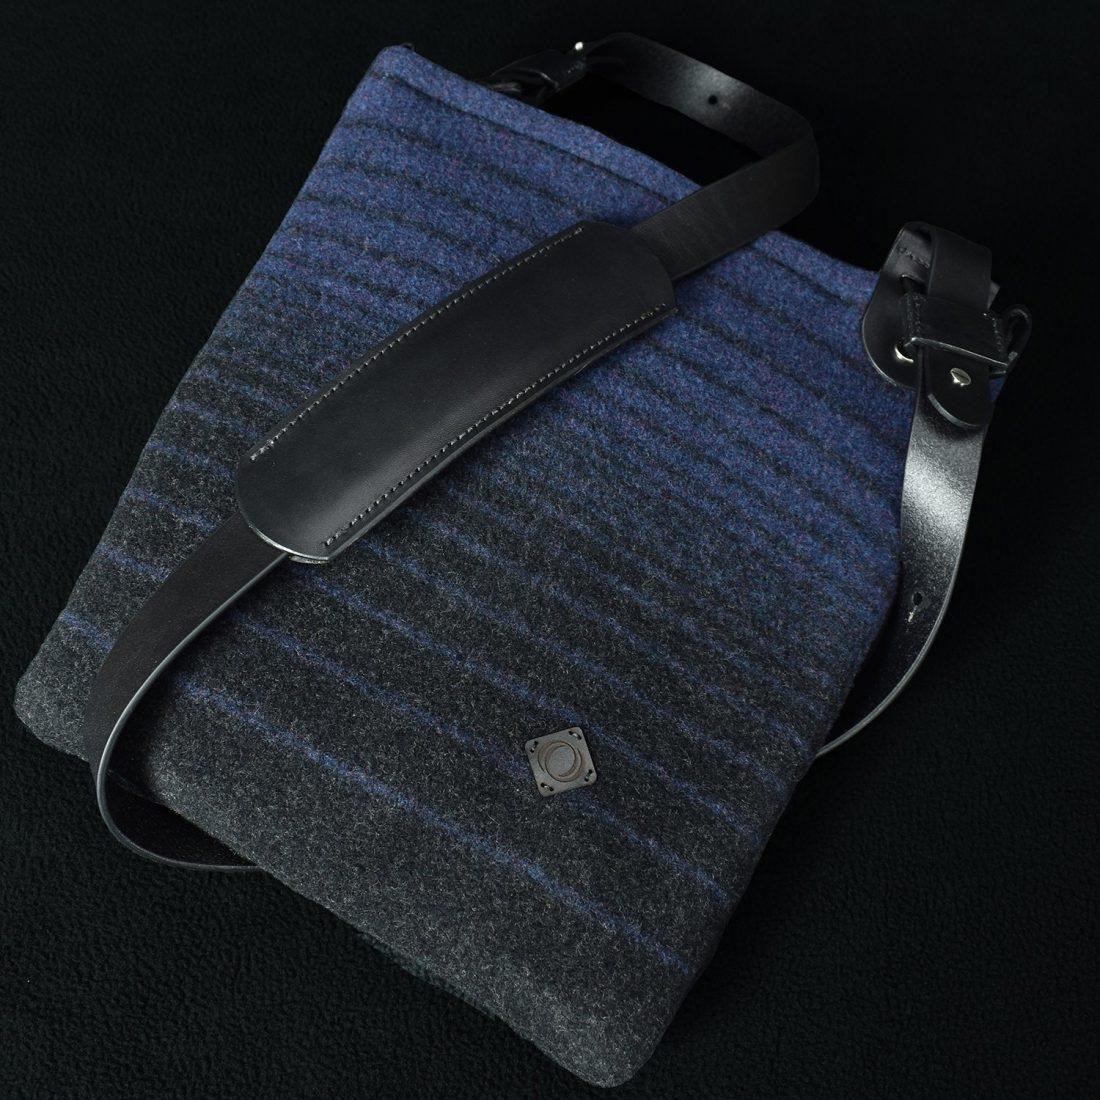 coarse cloth wool cross body bag blue and black stripes